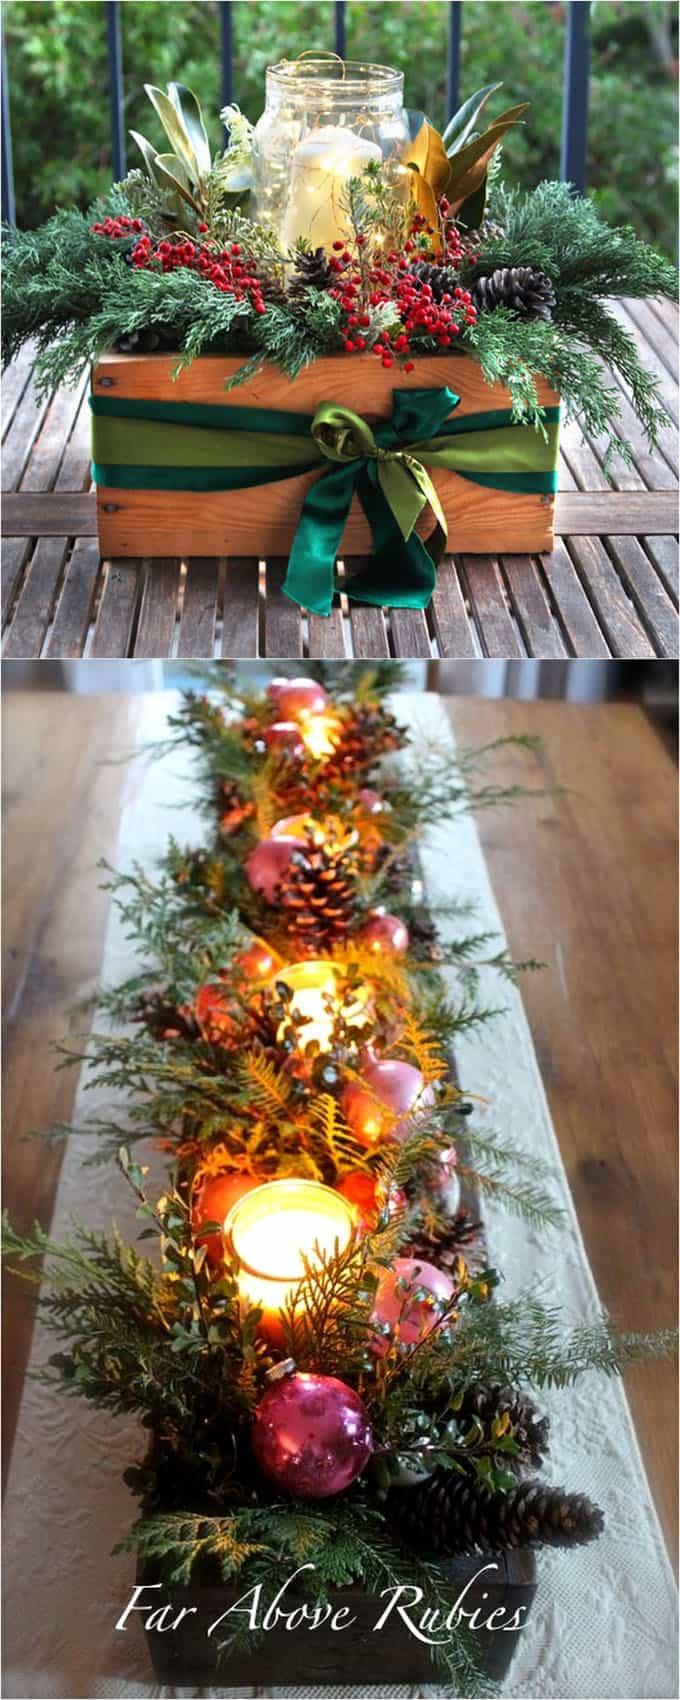 title | Christmas Table Centerpiece